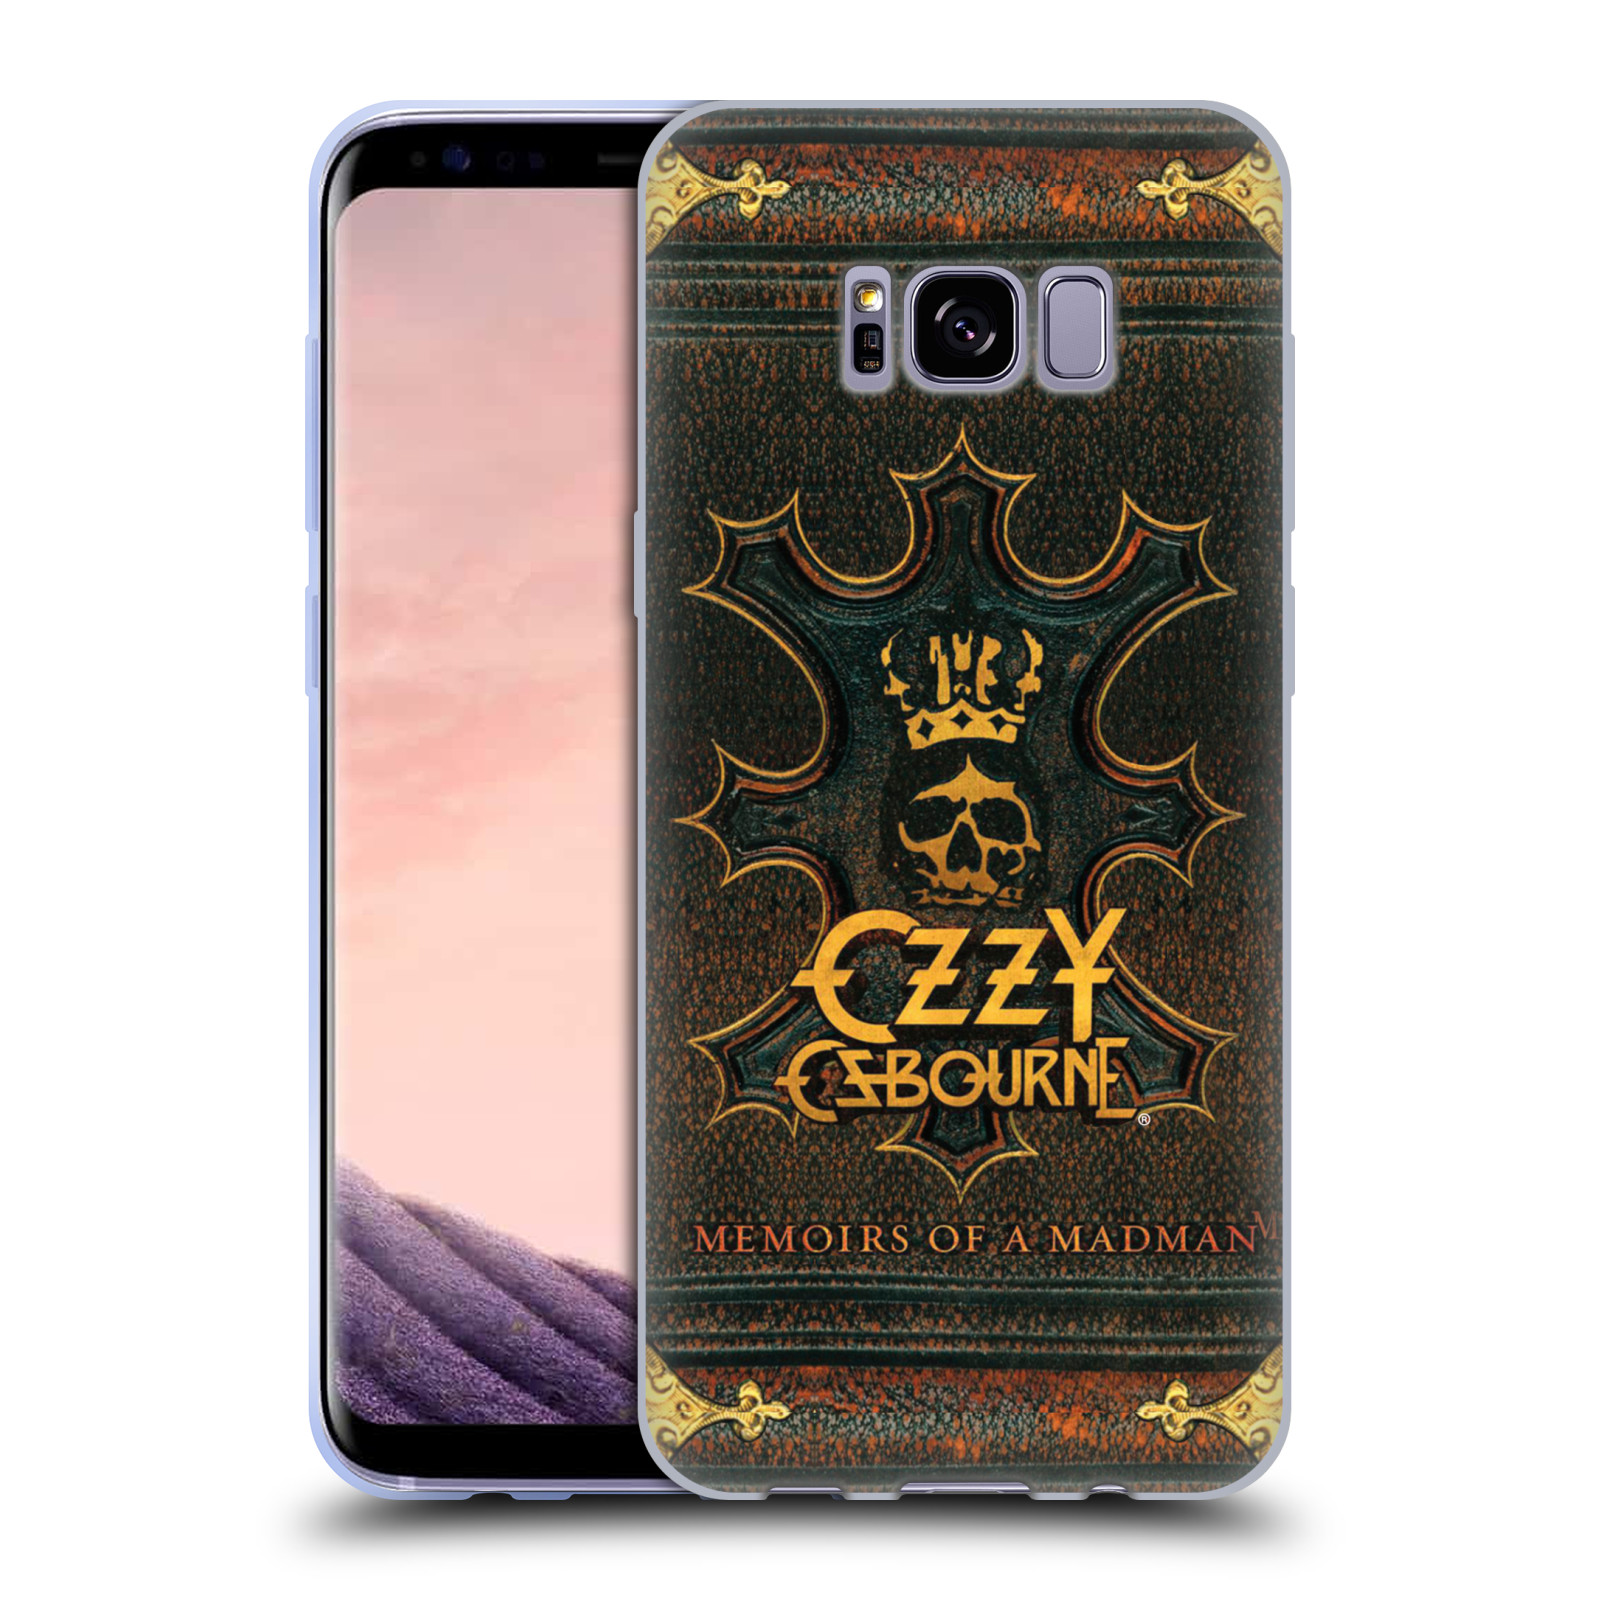 HEAD CASE silikonový obal na mobil Samsung Galaxy S8 PLUS zpěvák Ozzy Osbourne koruna